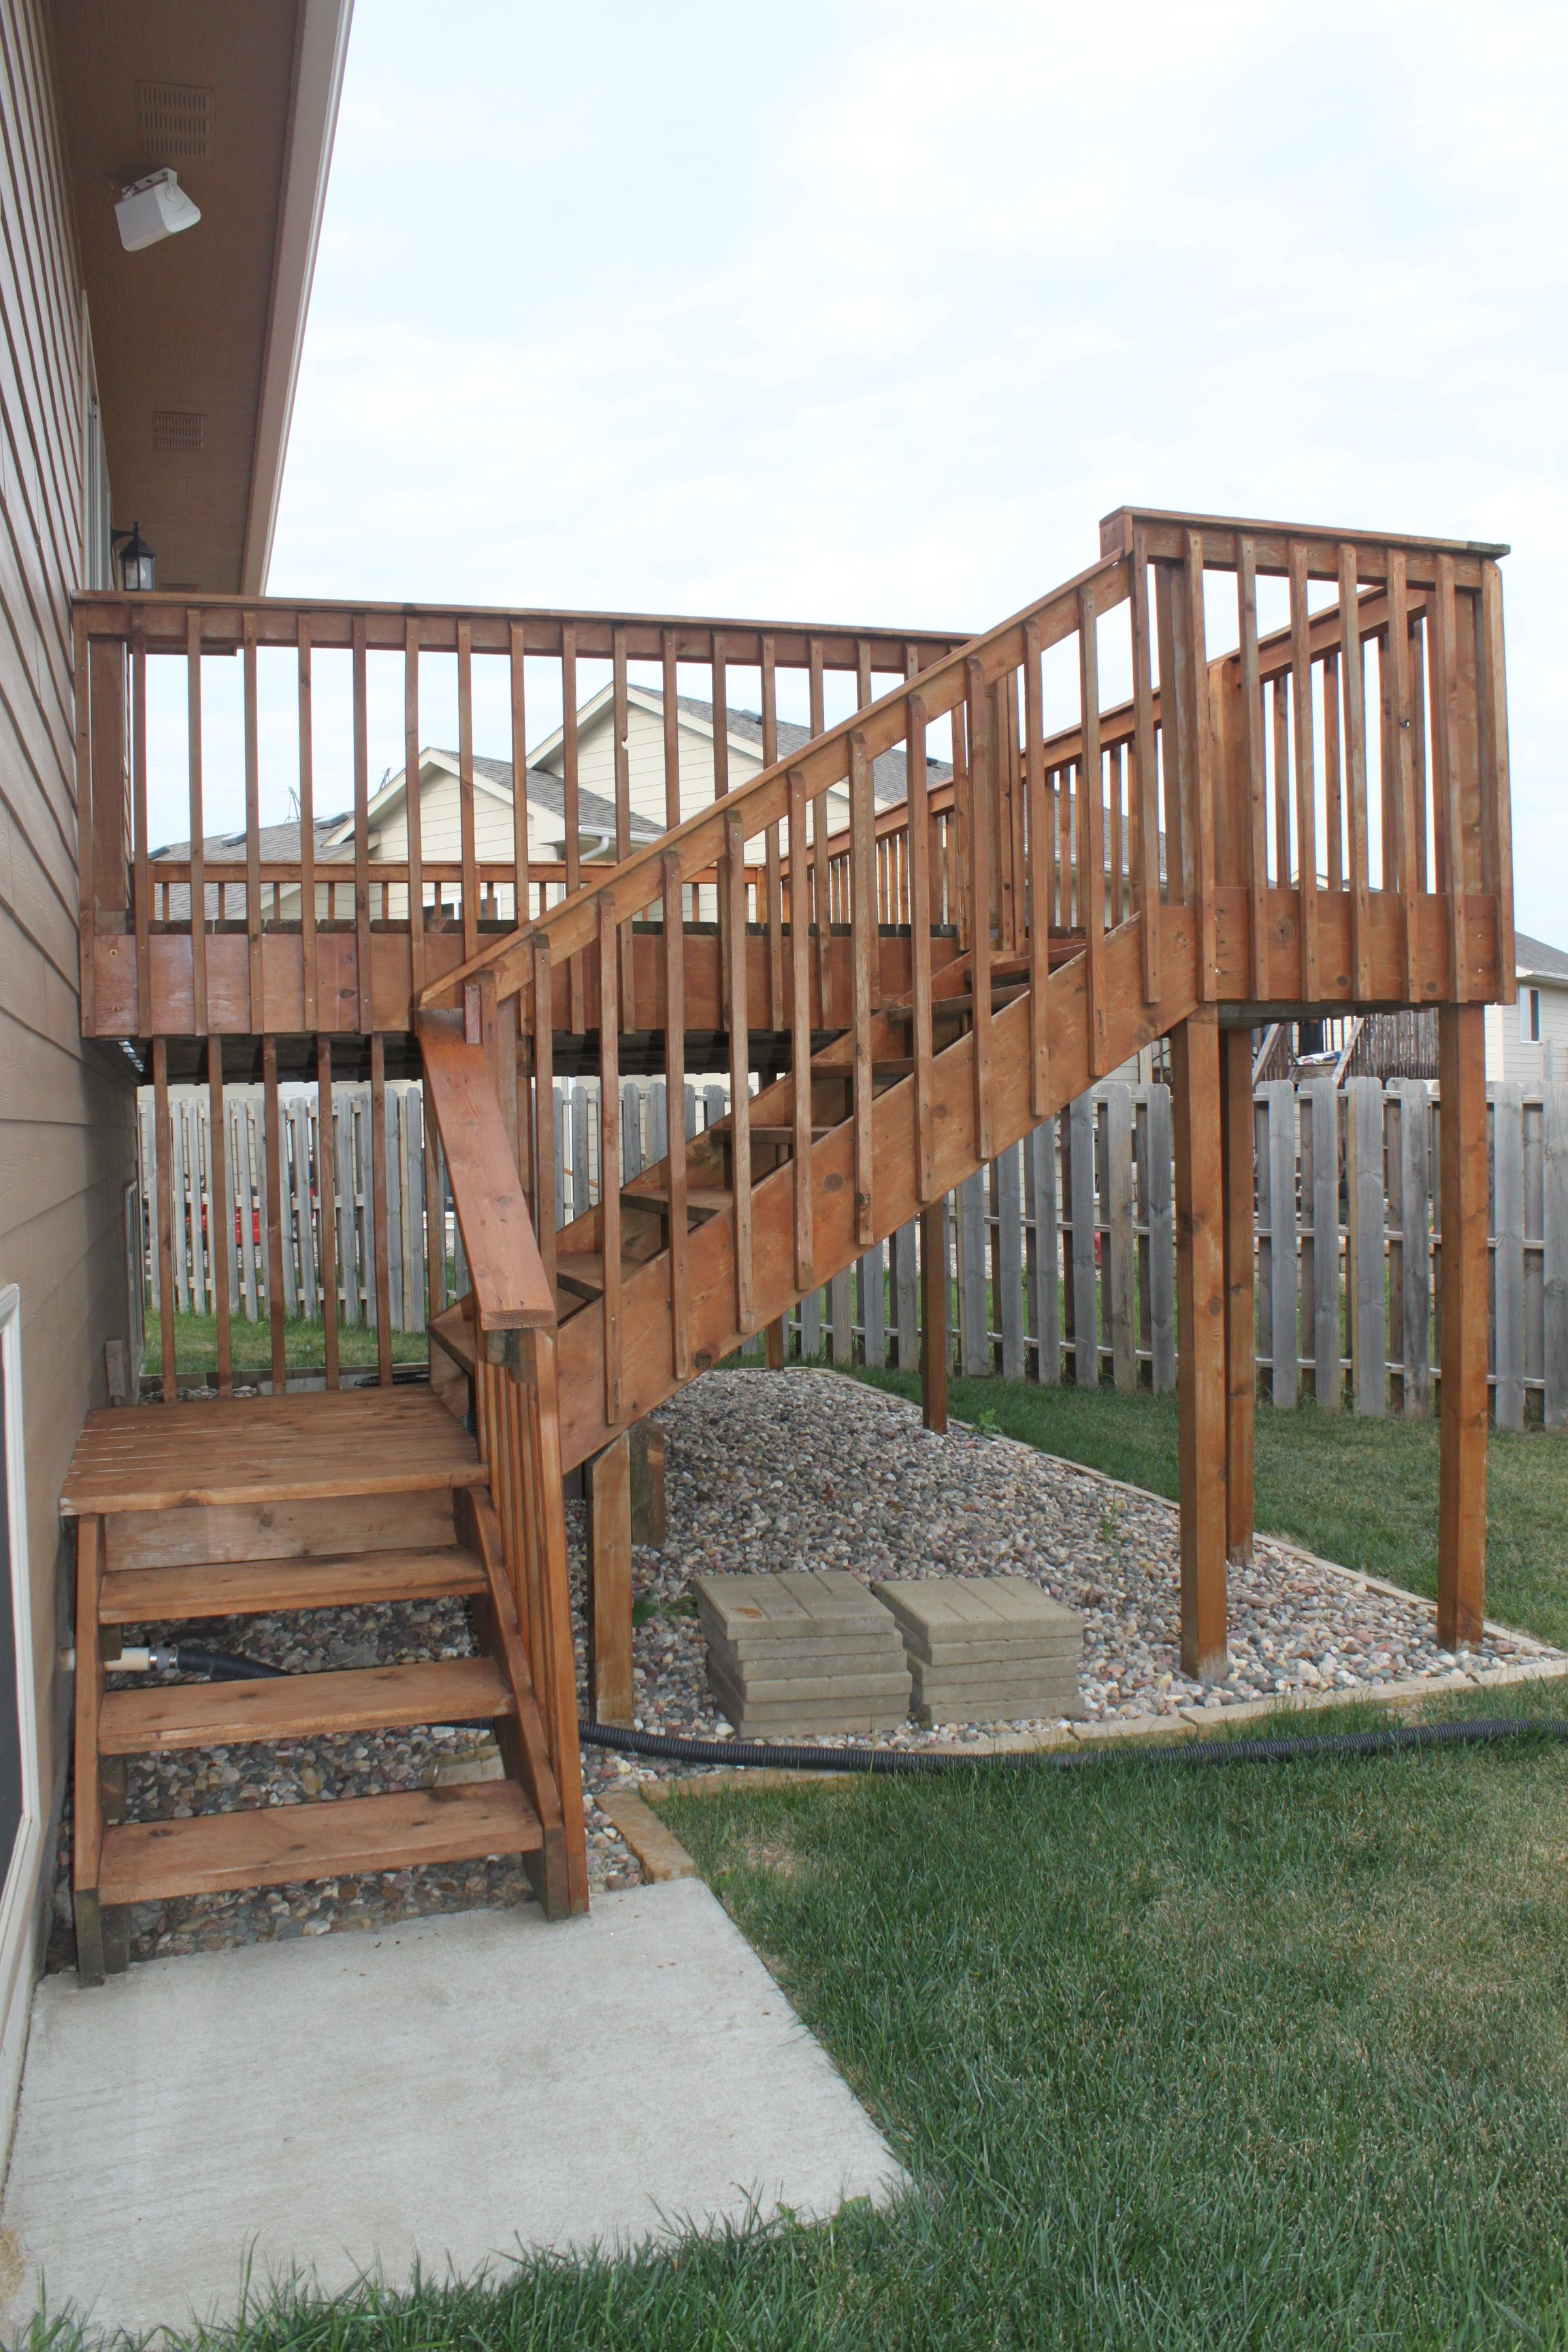 cousins deck backyard kitchen upstairs second floor - Google Search   Decks backyard. Deck stairs. Deck stair railing